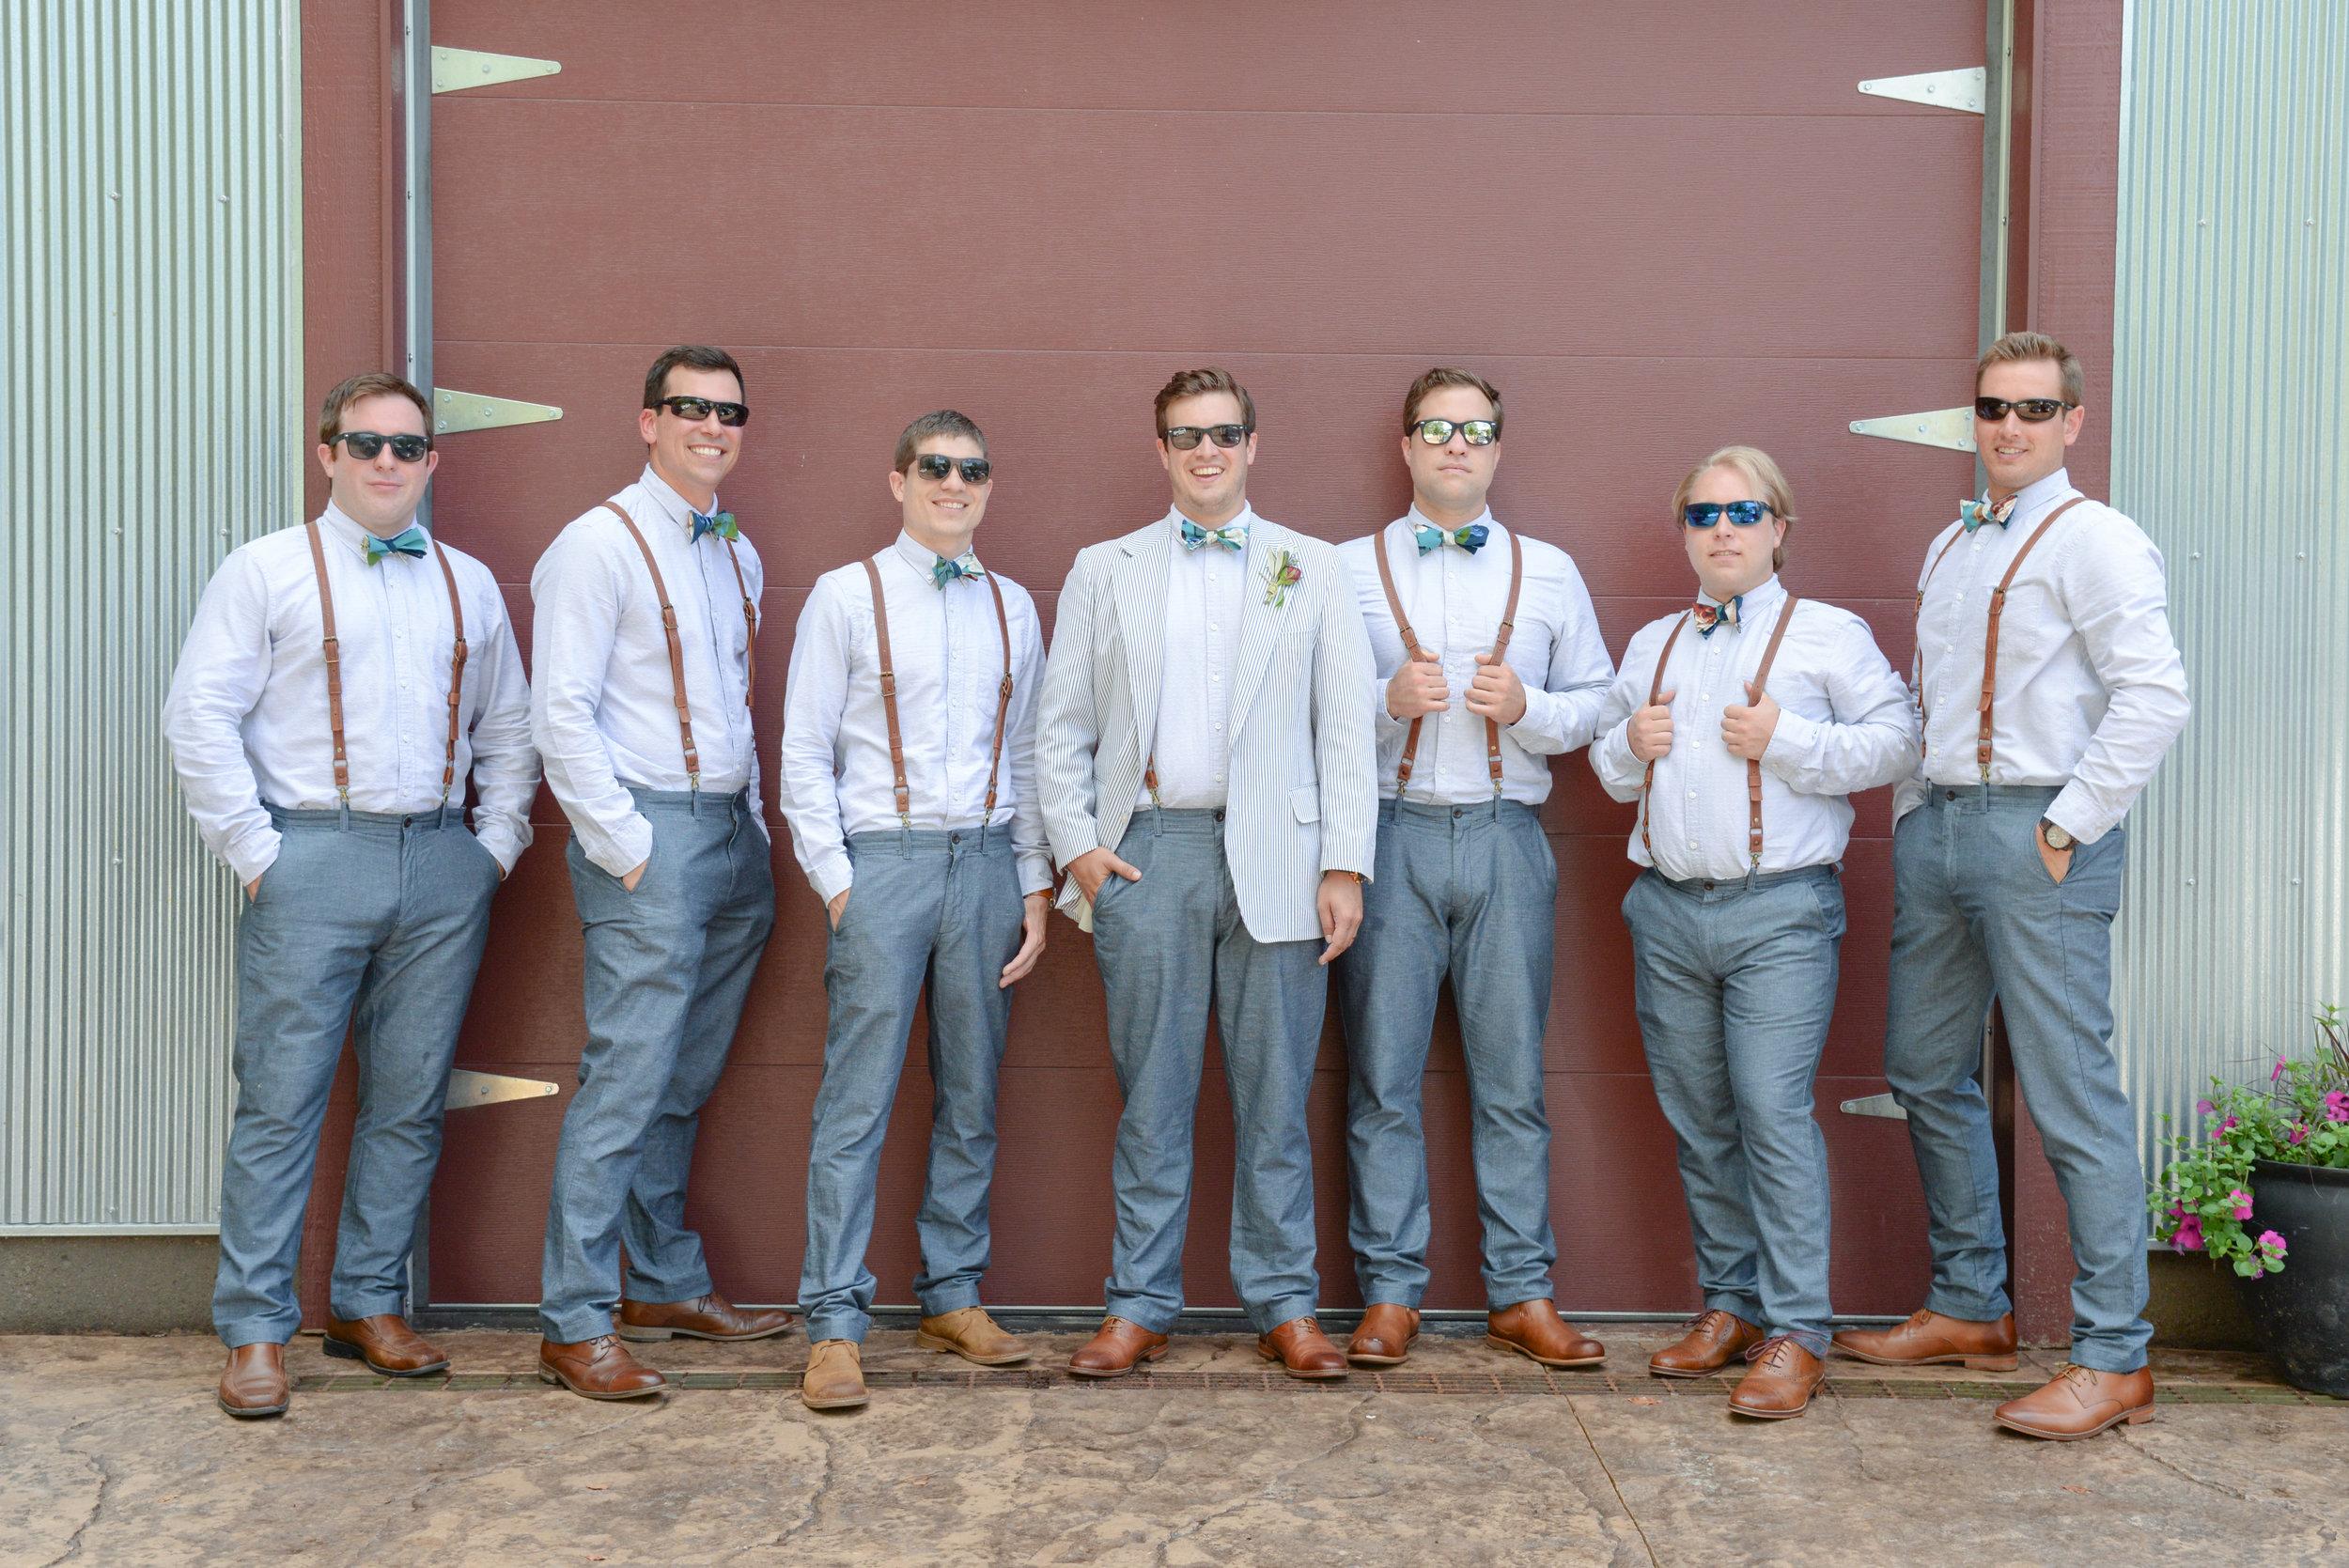 style altard st louis wedding groomsmen shot